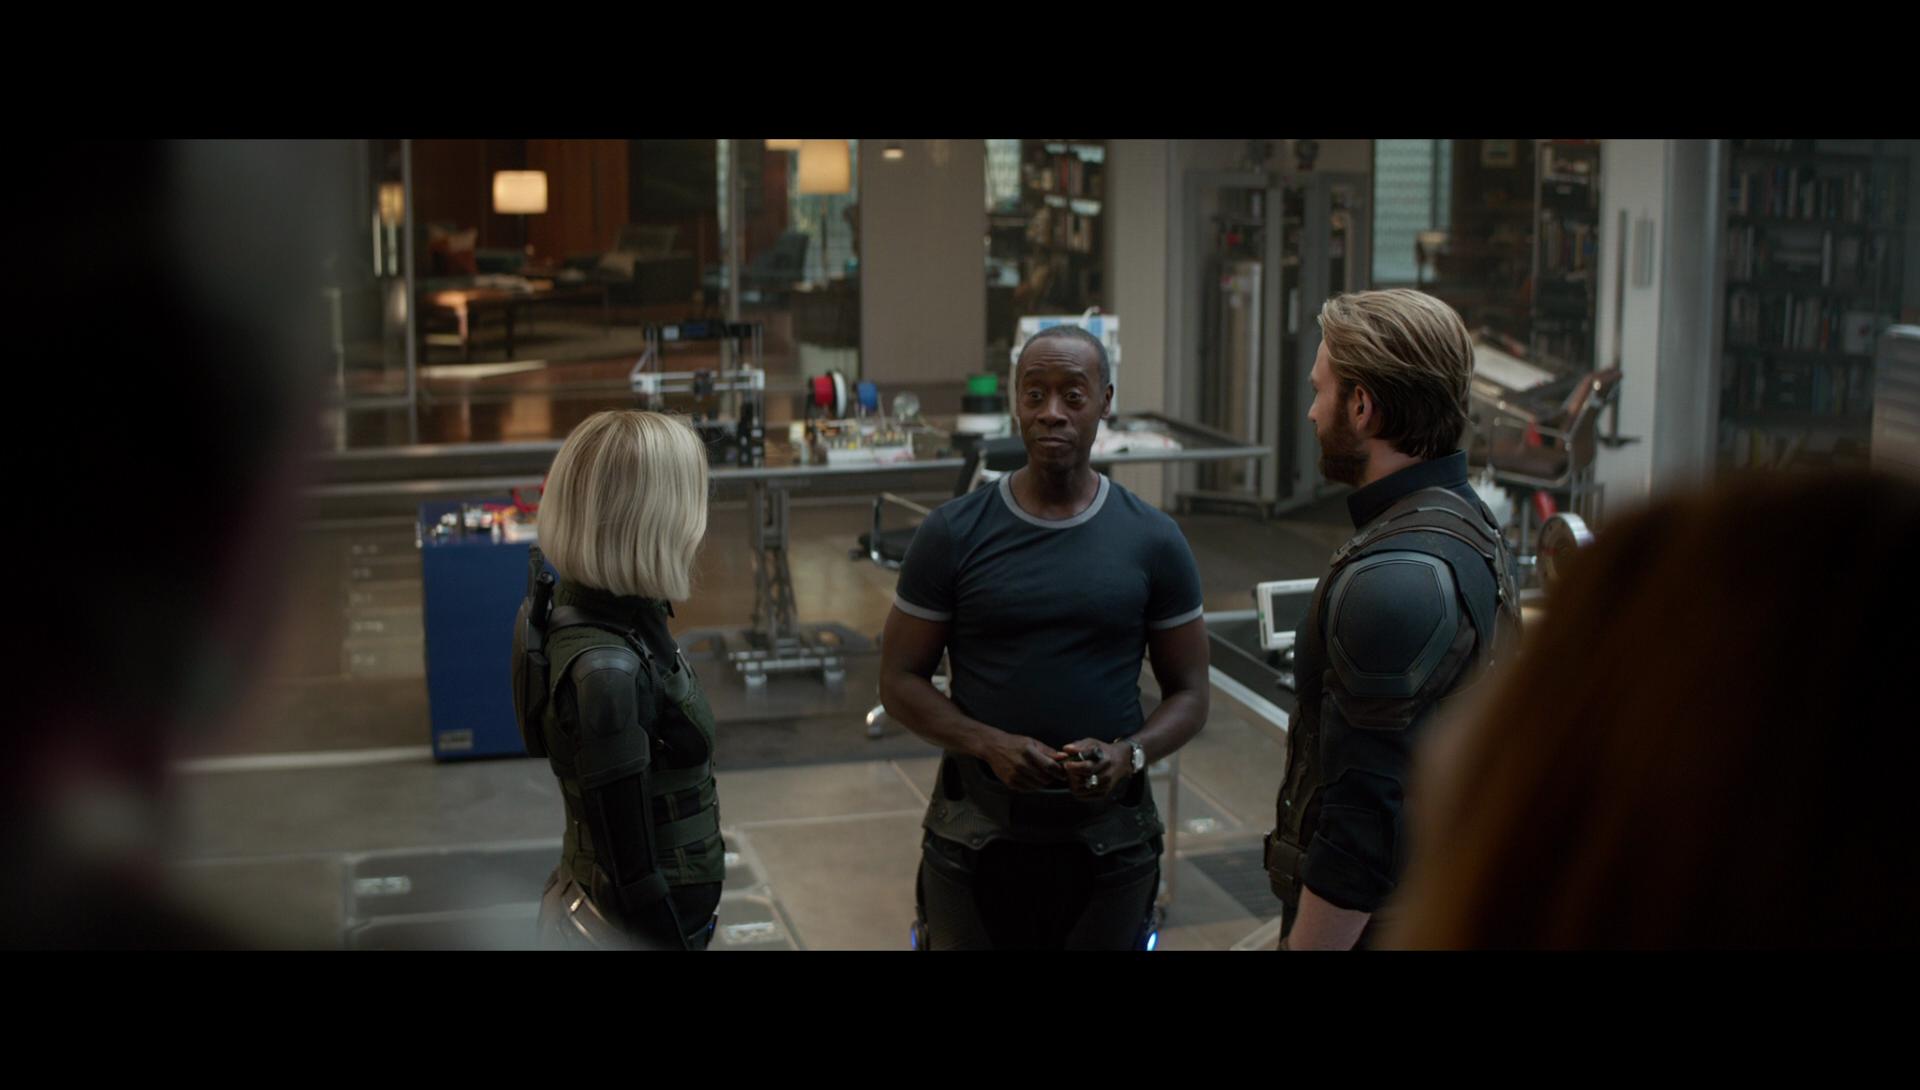 Avengers: Infinity War (2018) 1080p Blu-ray AVC DTS-HD MA 7.1-MTeam